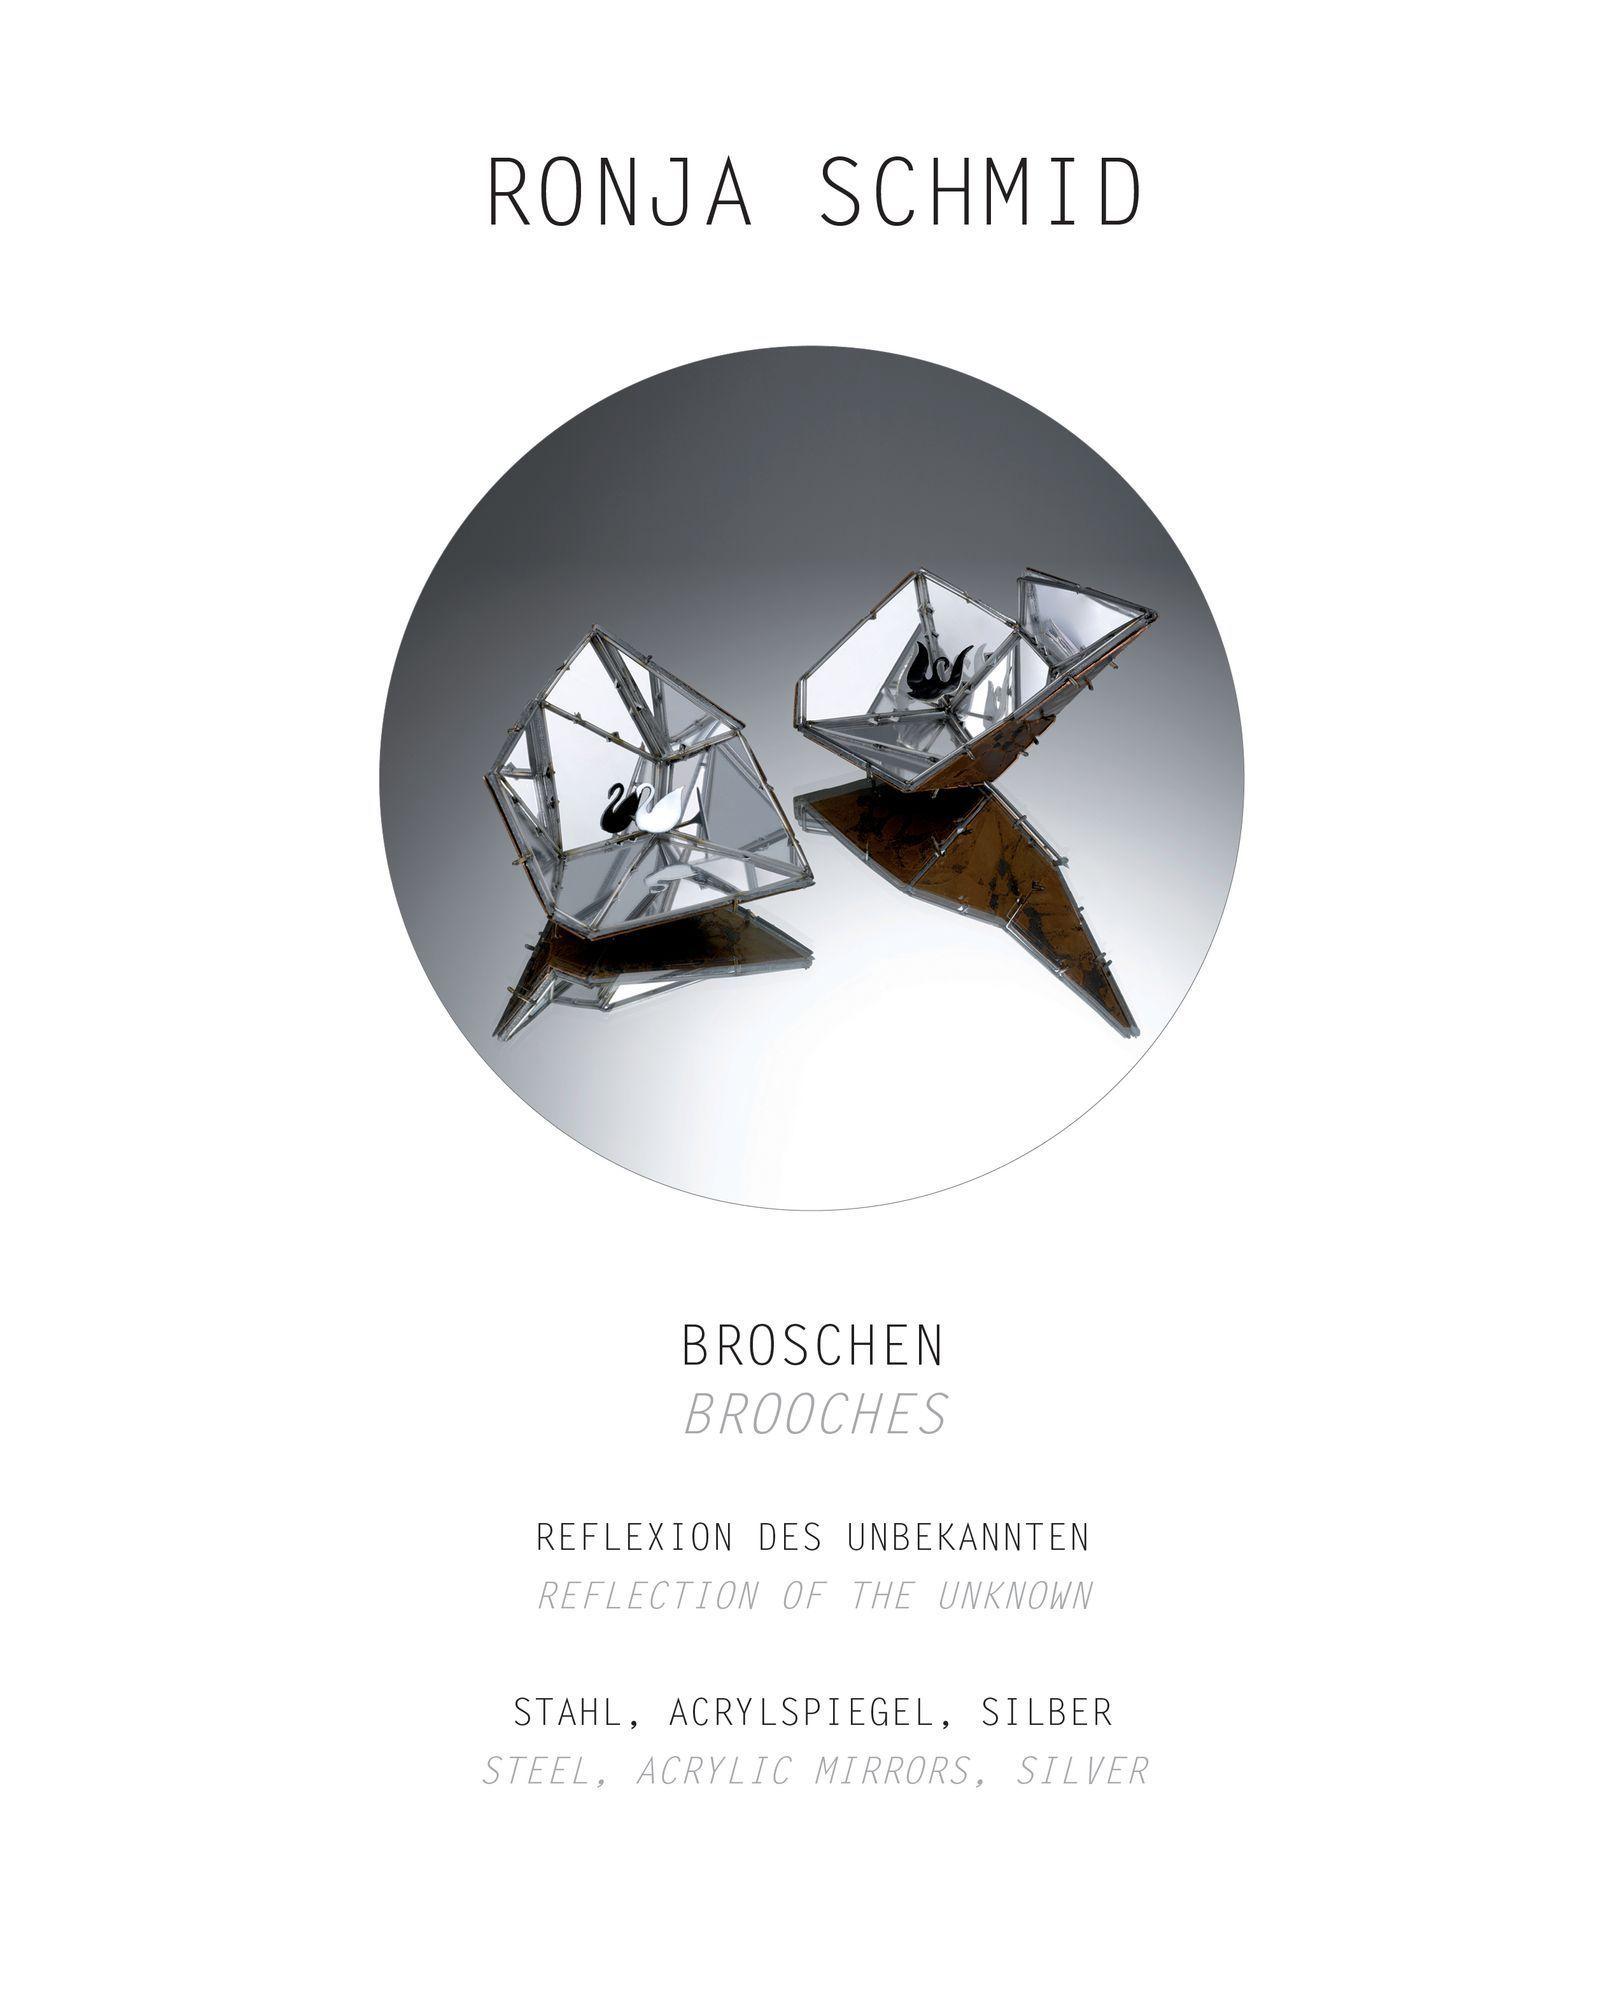 Ronja-Schmid